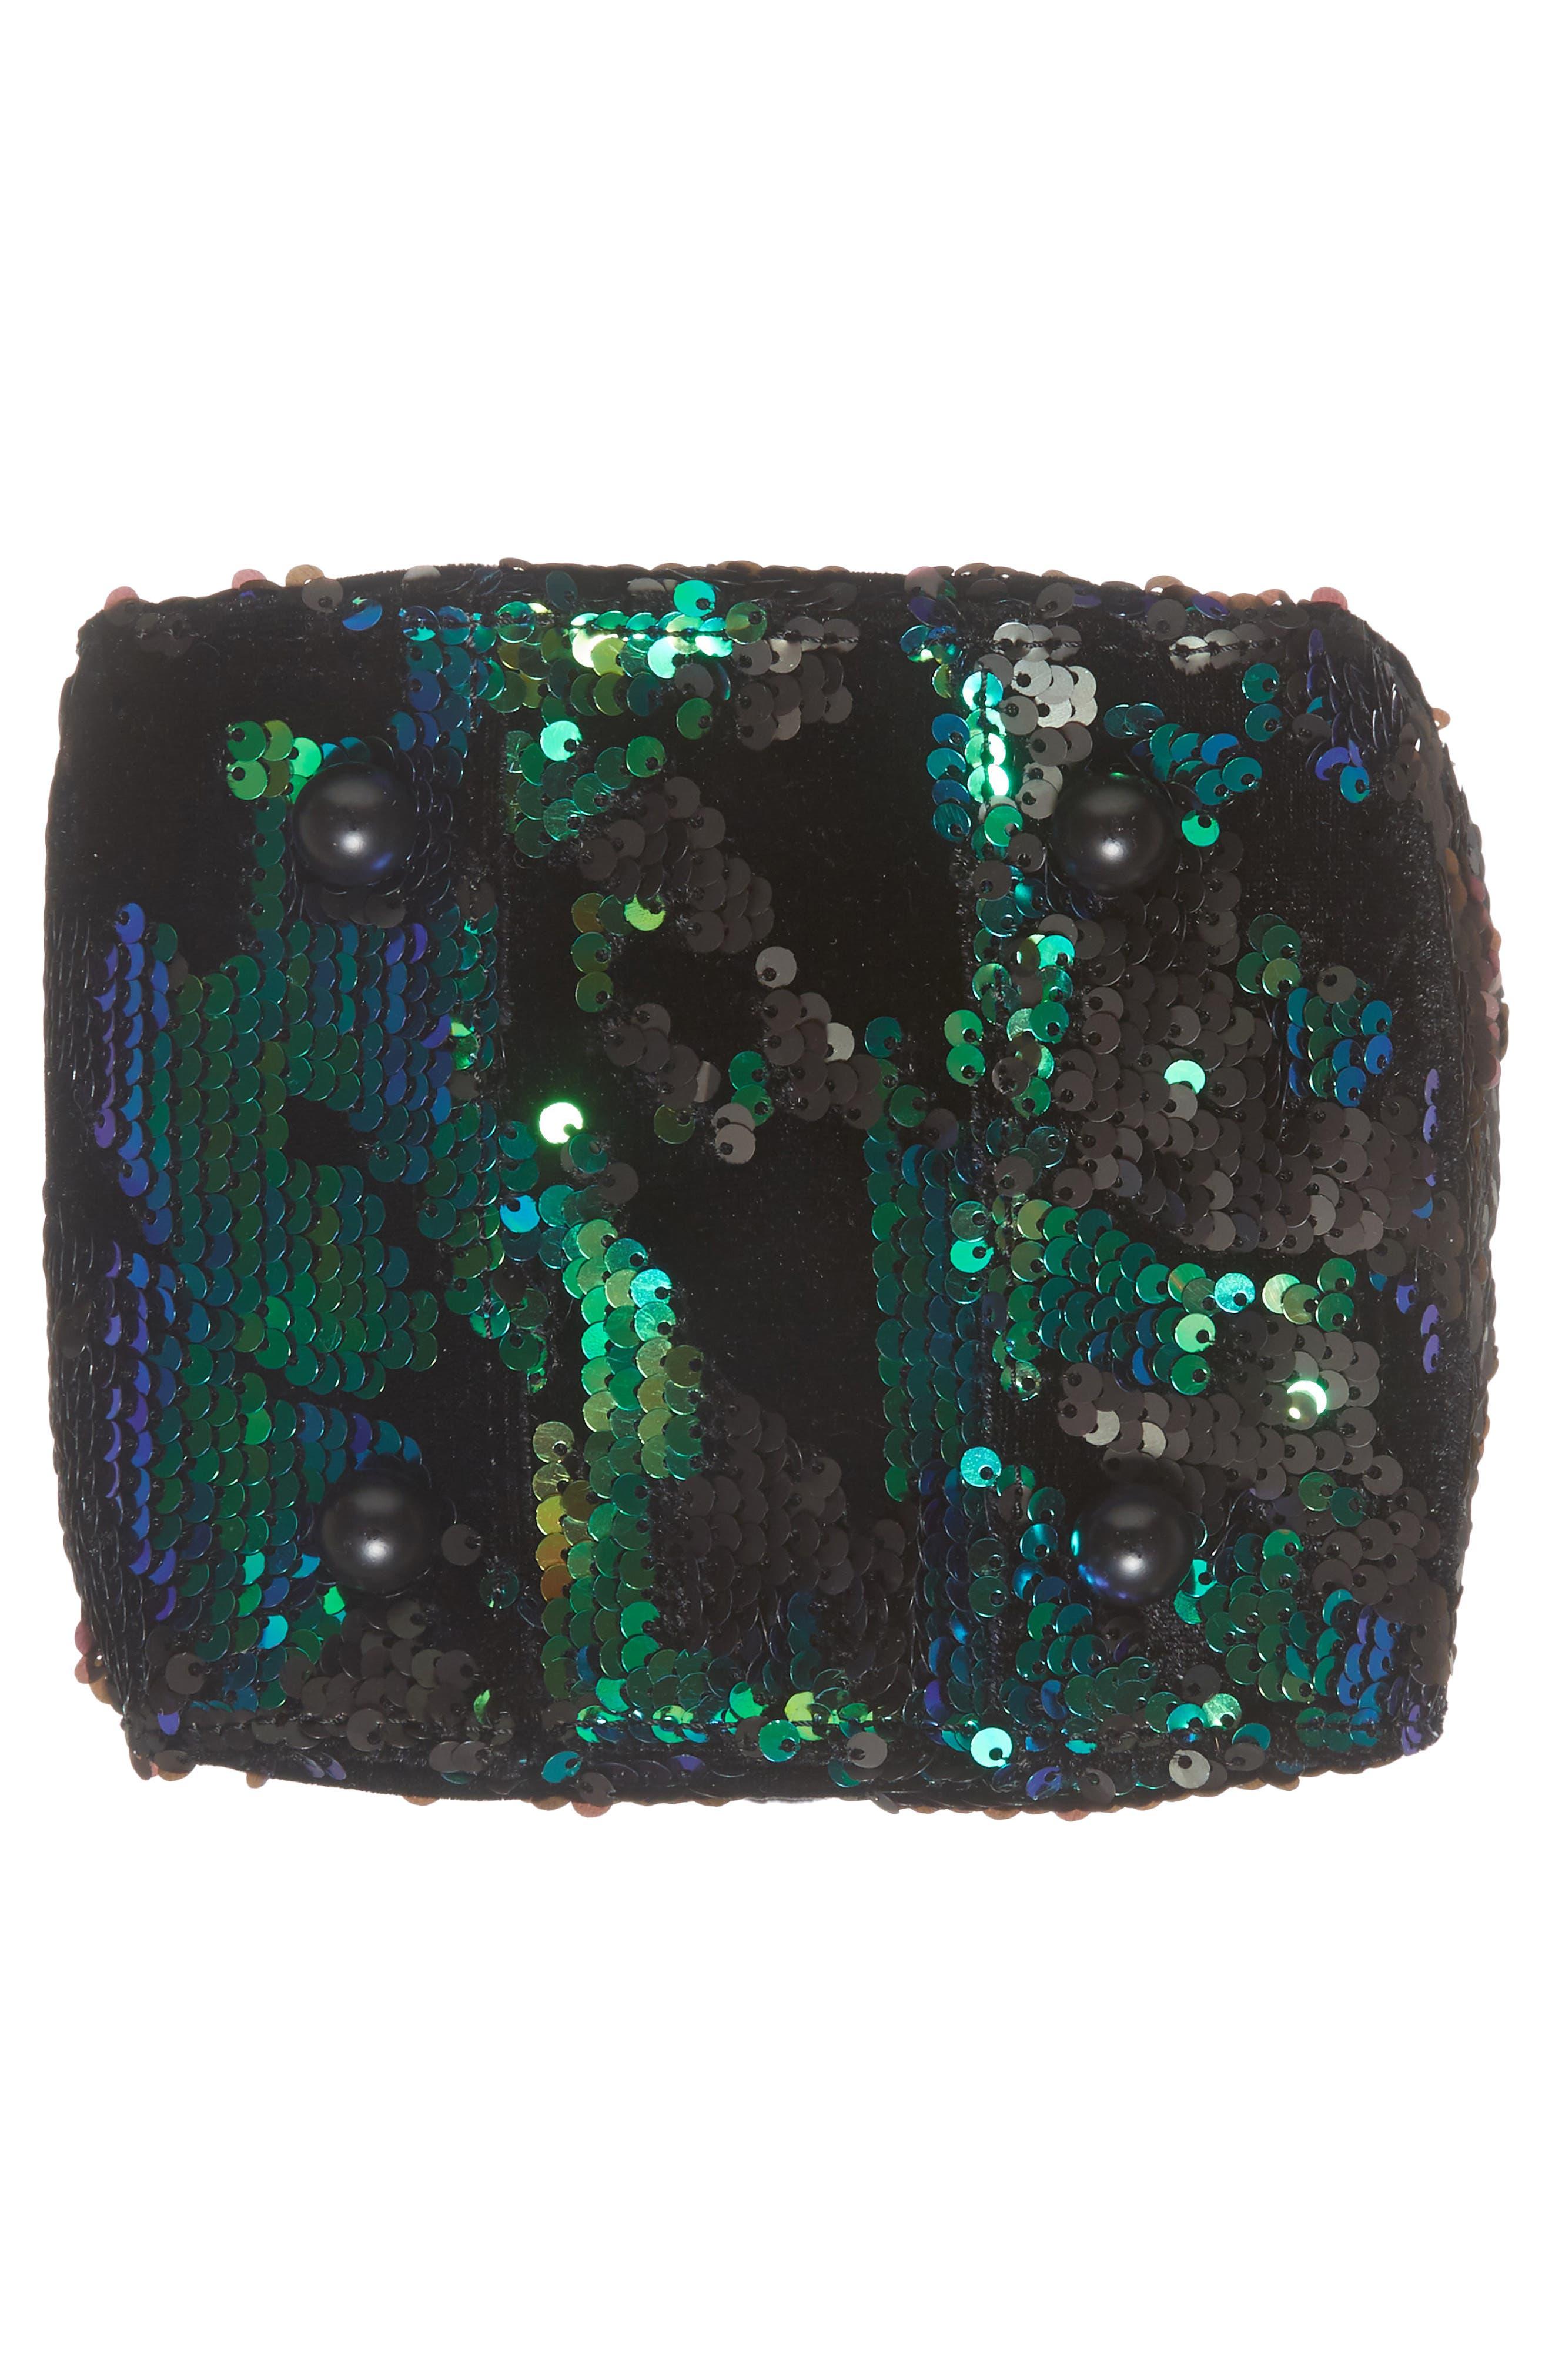 Amy Sequin Bucket Bag,                             Alternate thumbnail 6, color,                             Iridescent Sequins